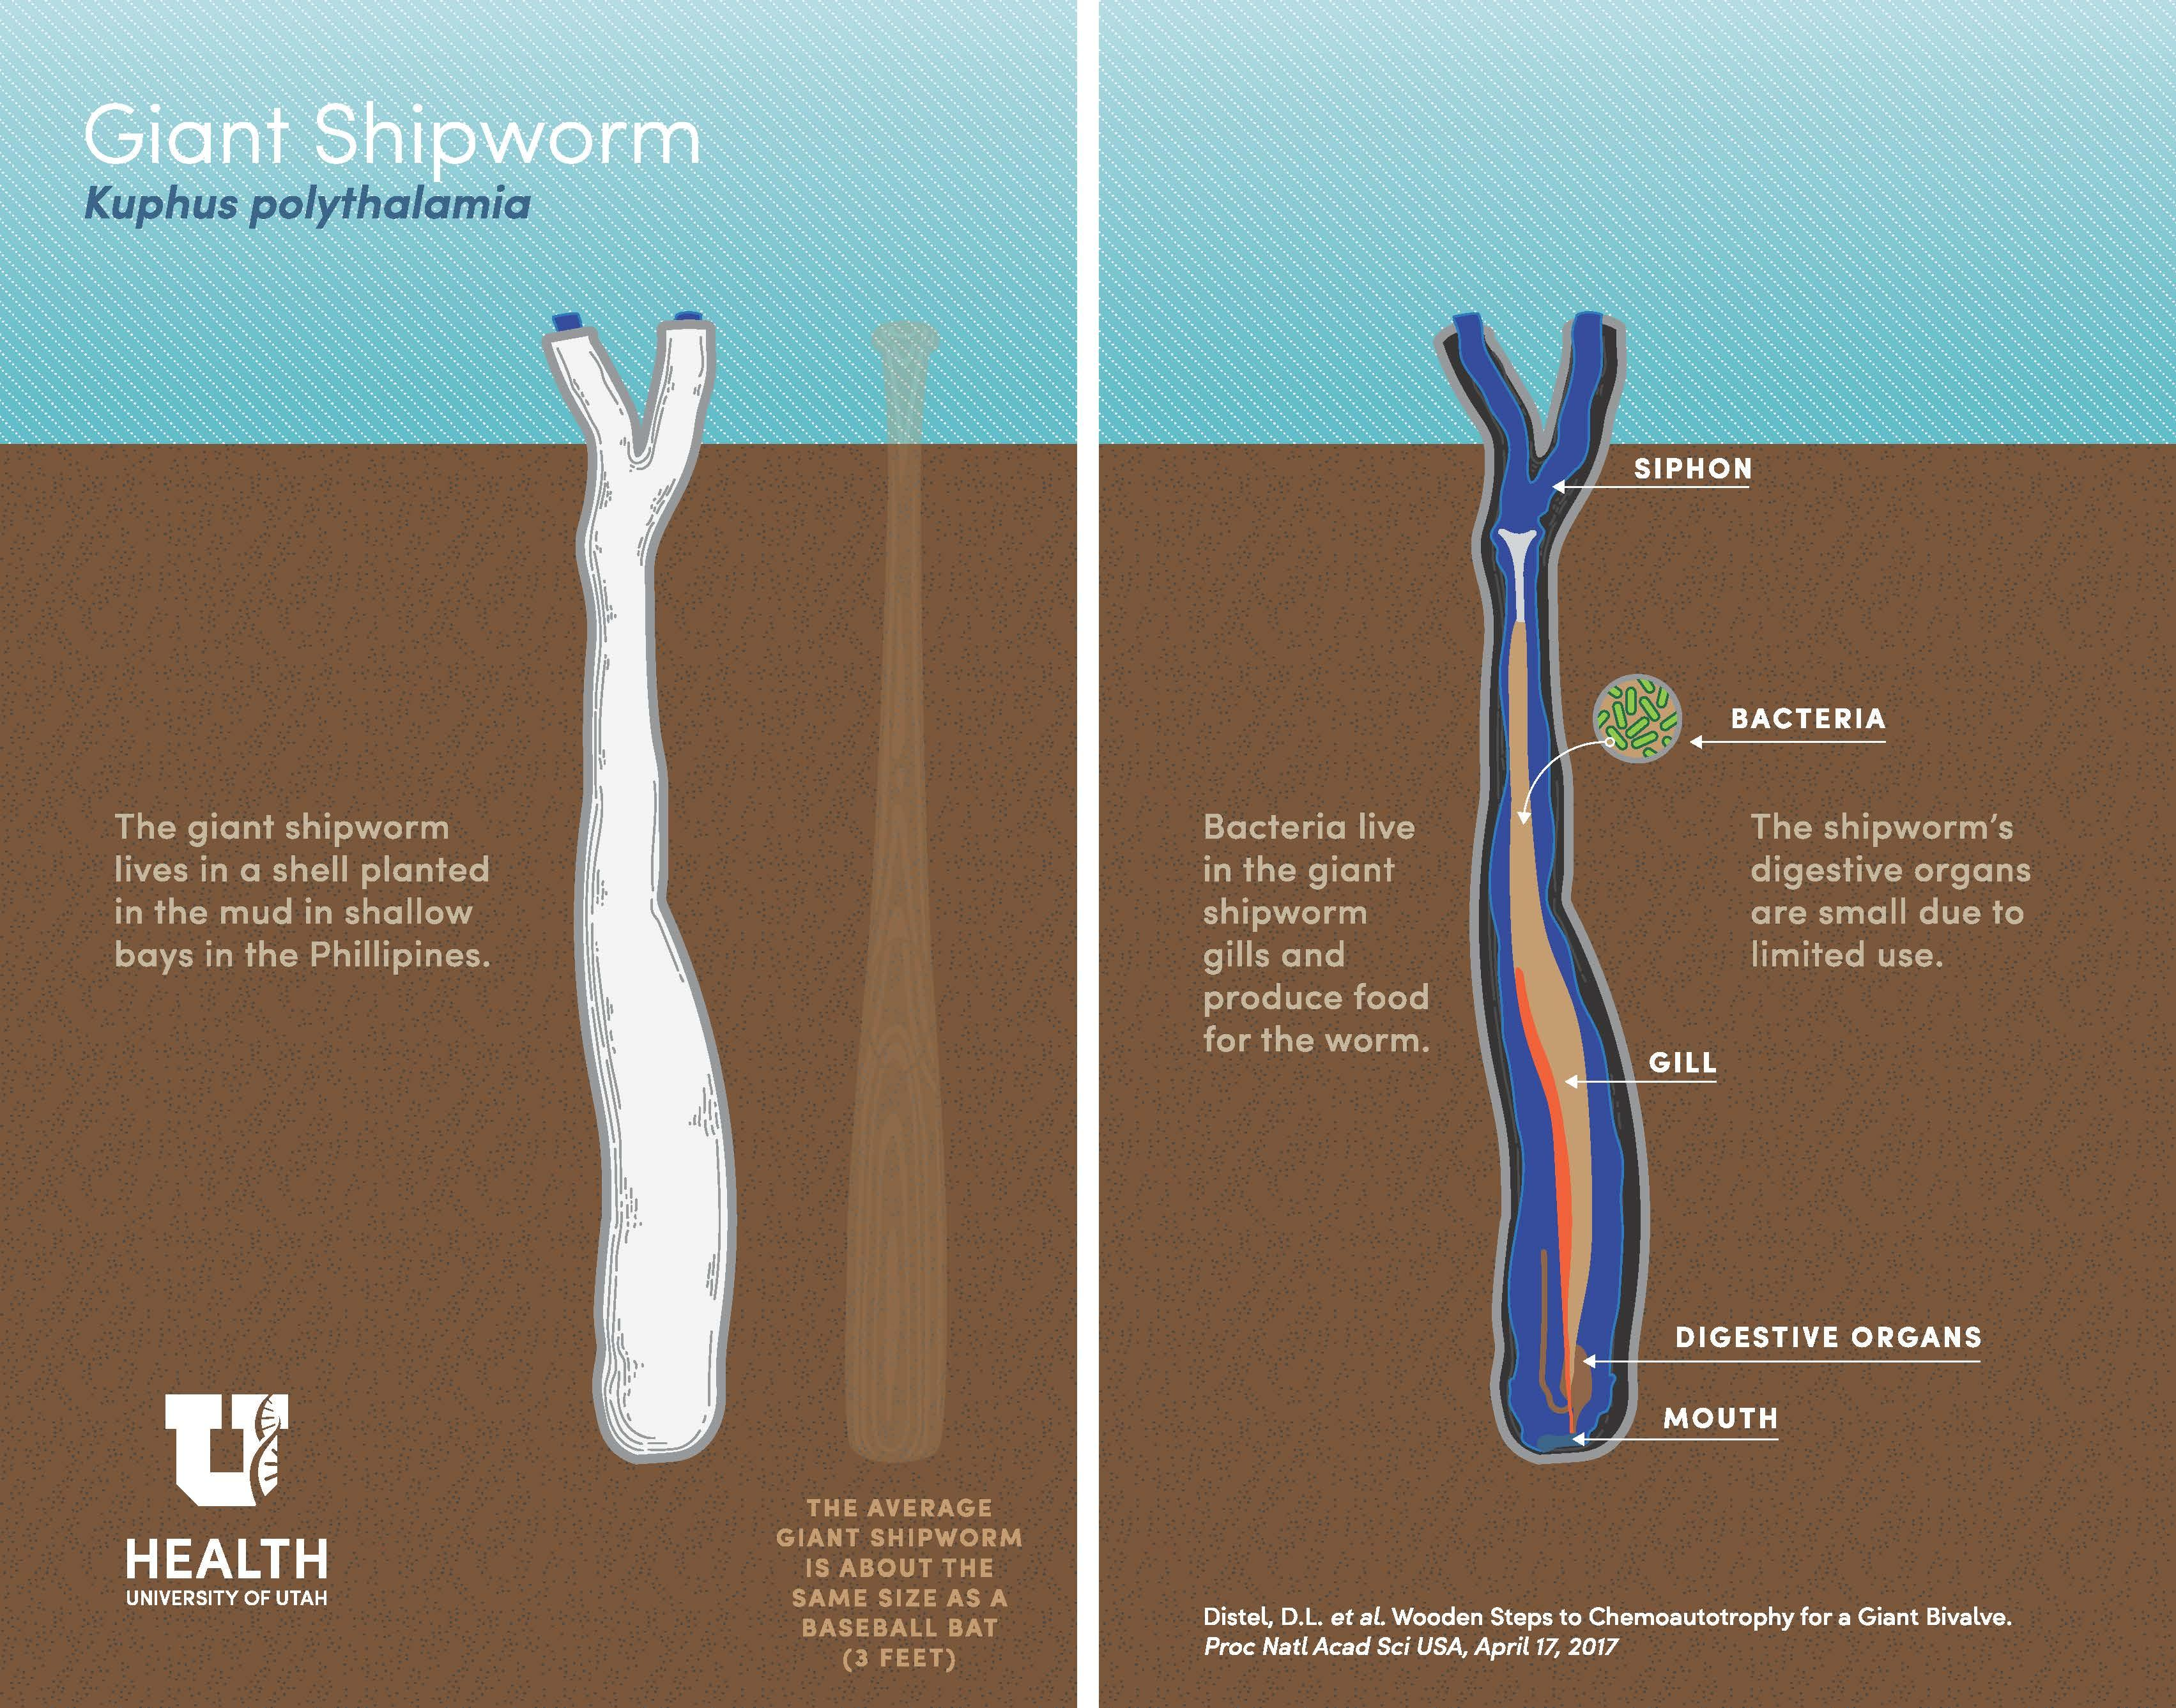 shipworm-infographic-logo.jpeg